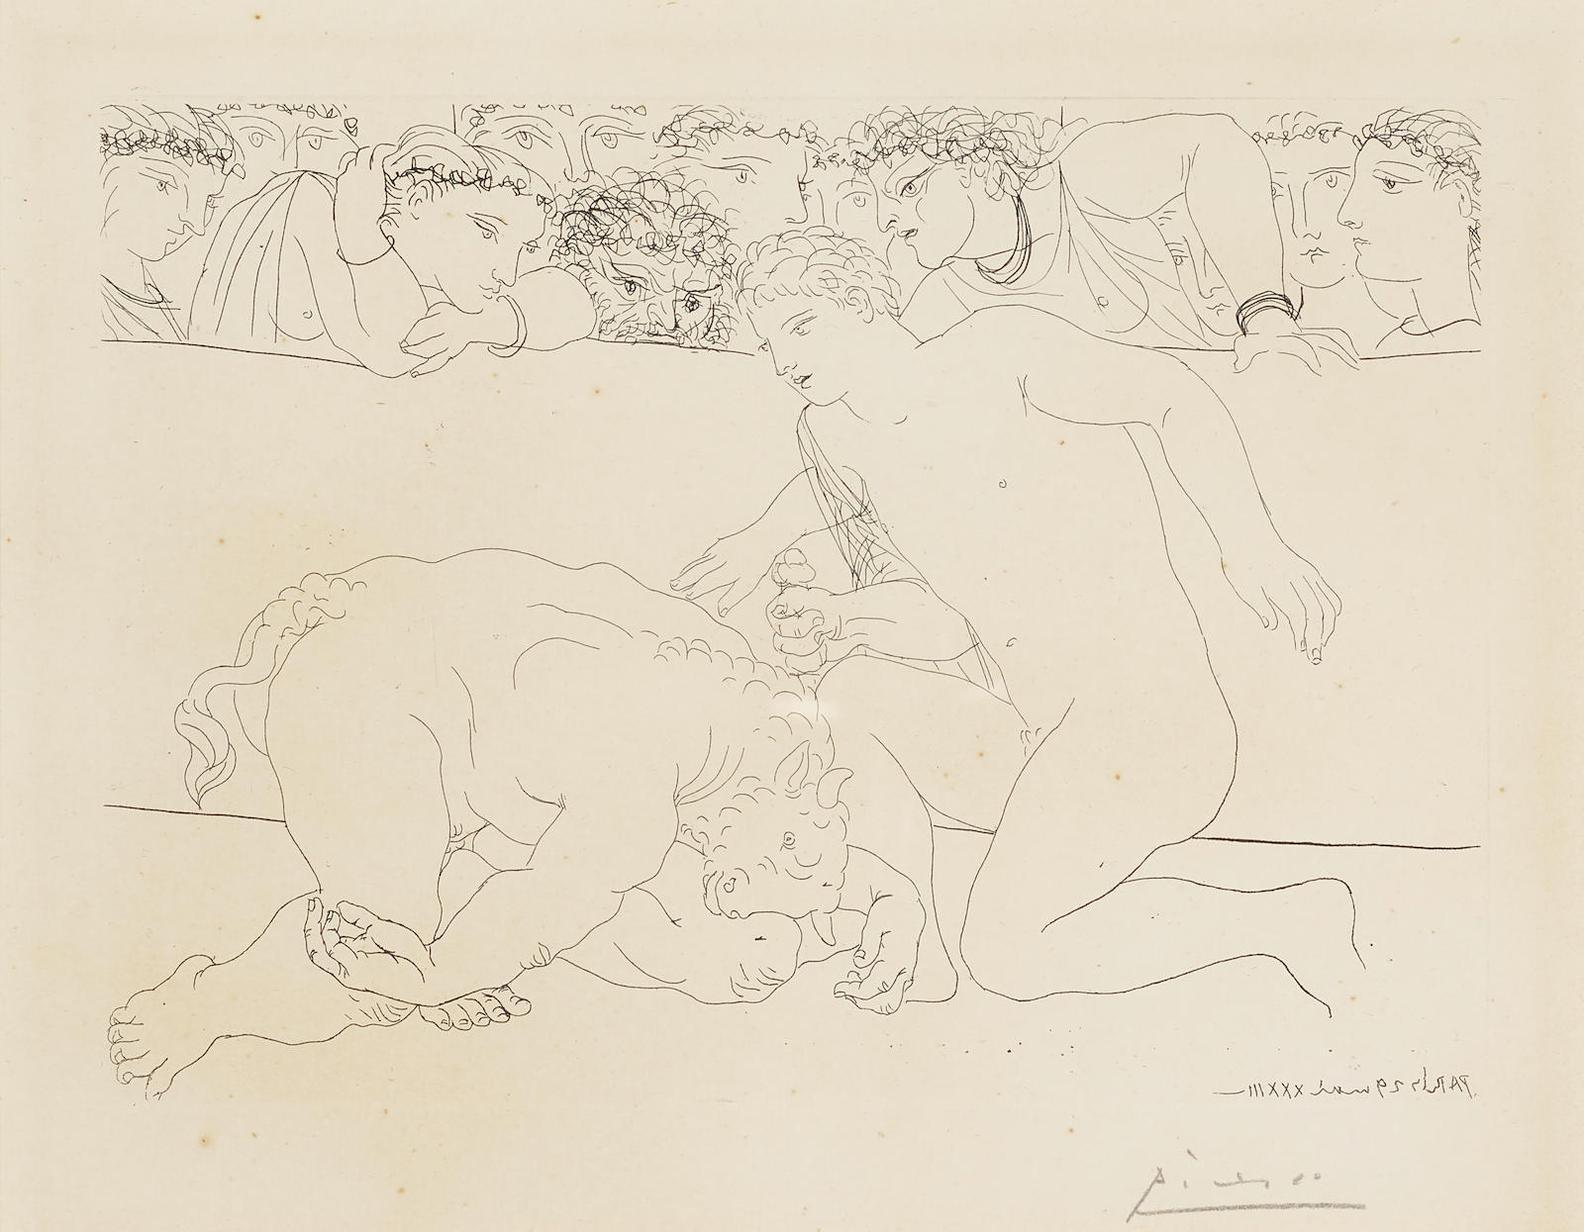 Pablo Picasso-Minotaure Vaincu, Pl. 89, From La Suite Vollard-1937